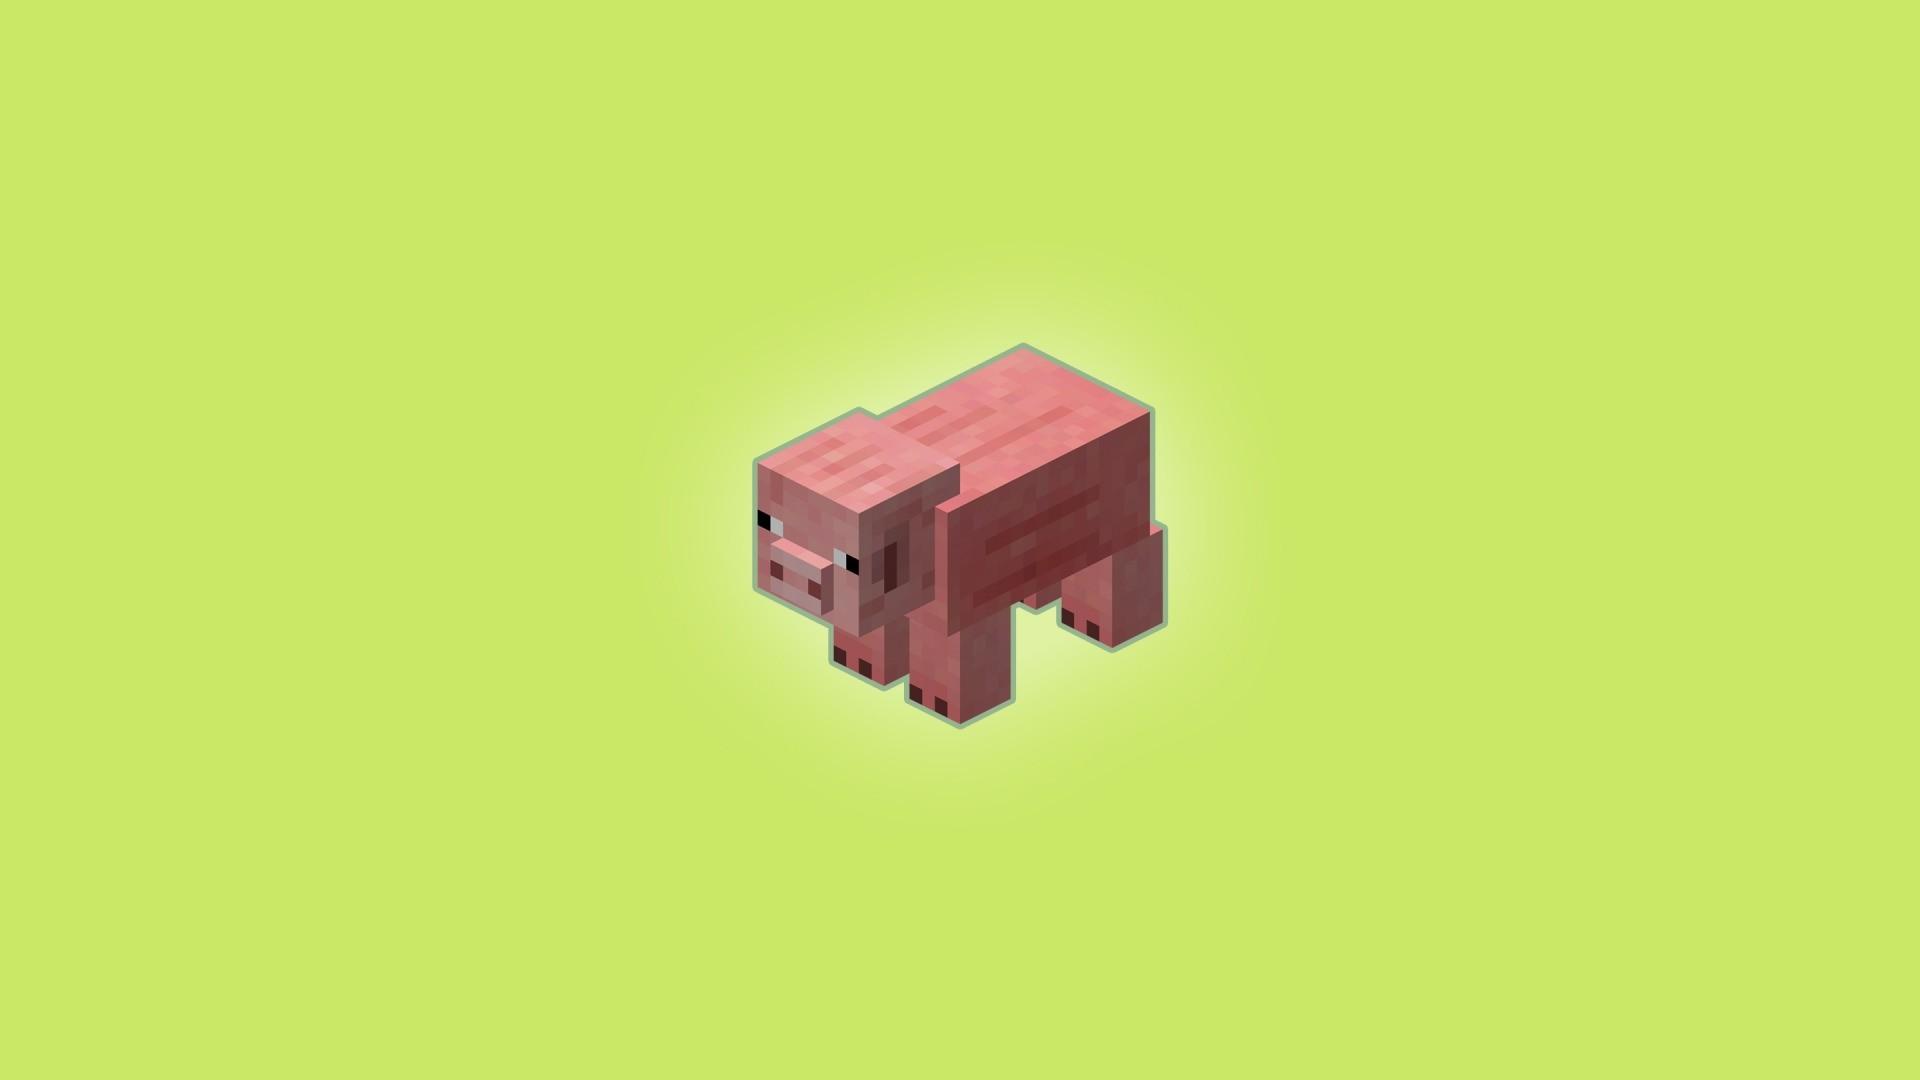 Minecraft Minimalist computer wallpaper